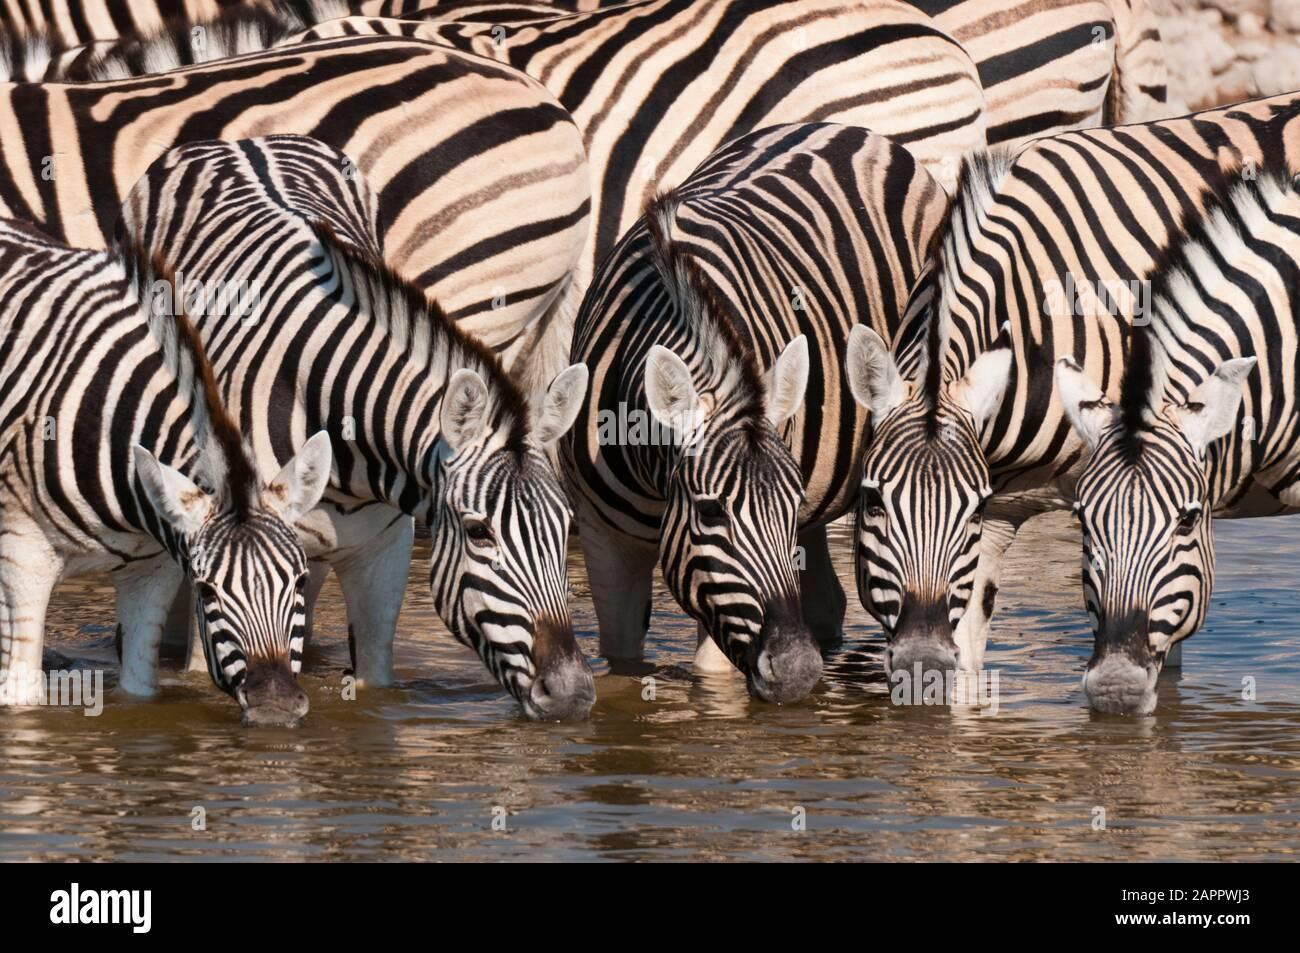 Zeal of burchell's zebras (Equus burchellii) drinking at waterhole, Etosha National Park, Namibia Stock Photo